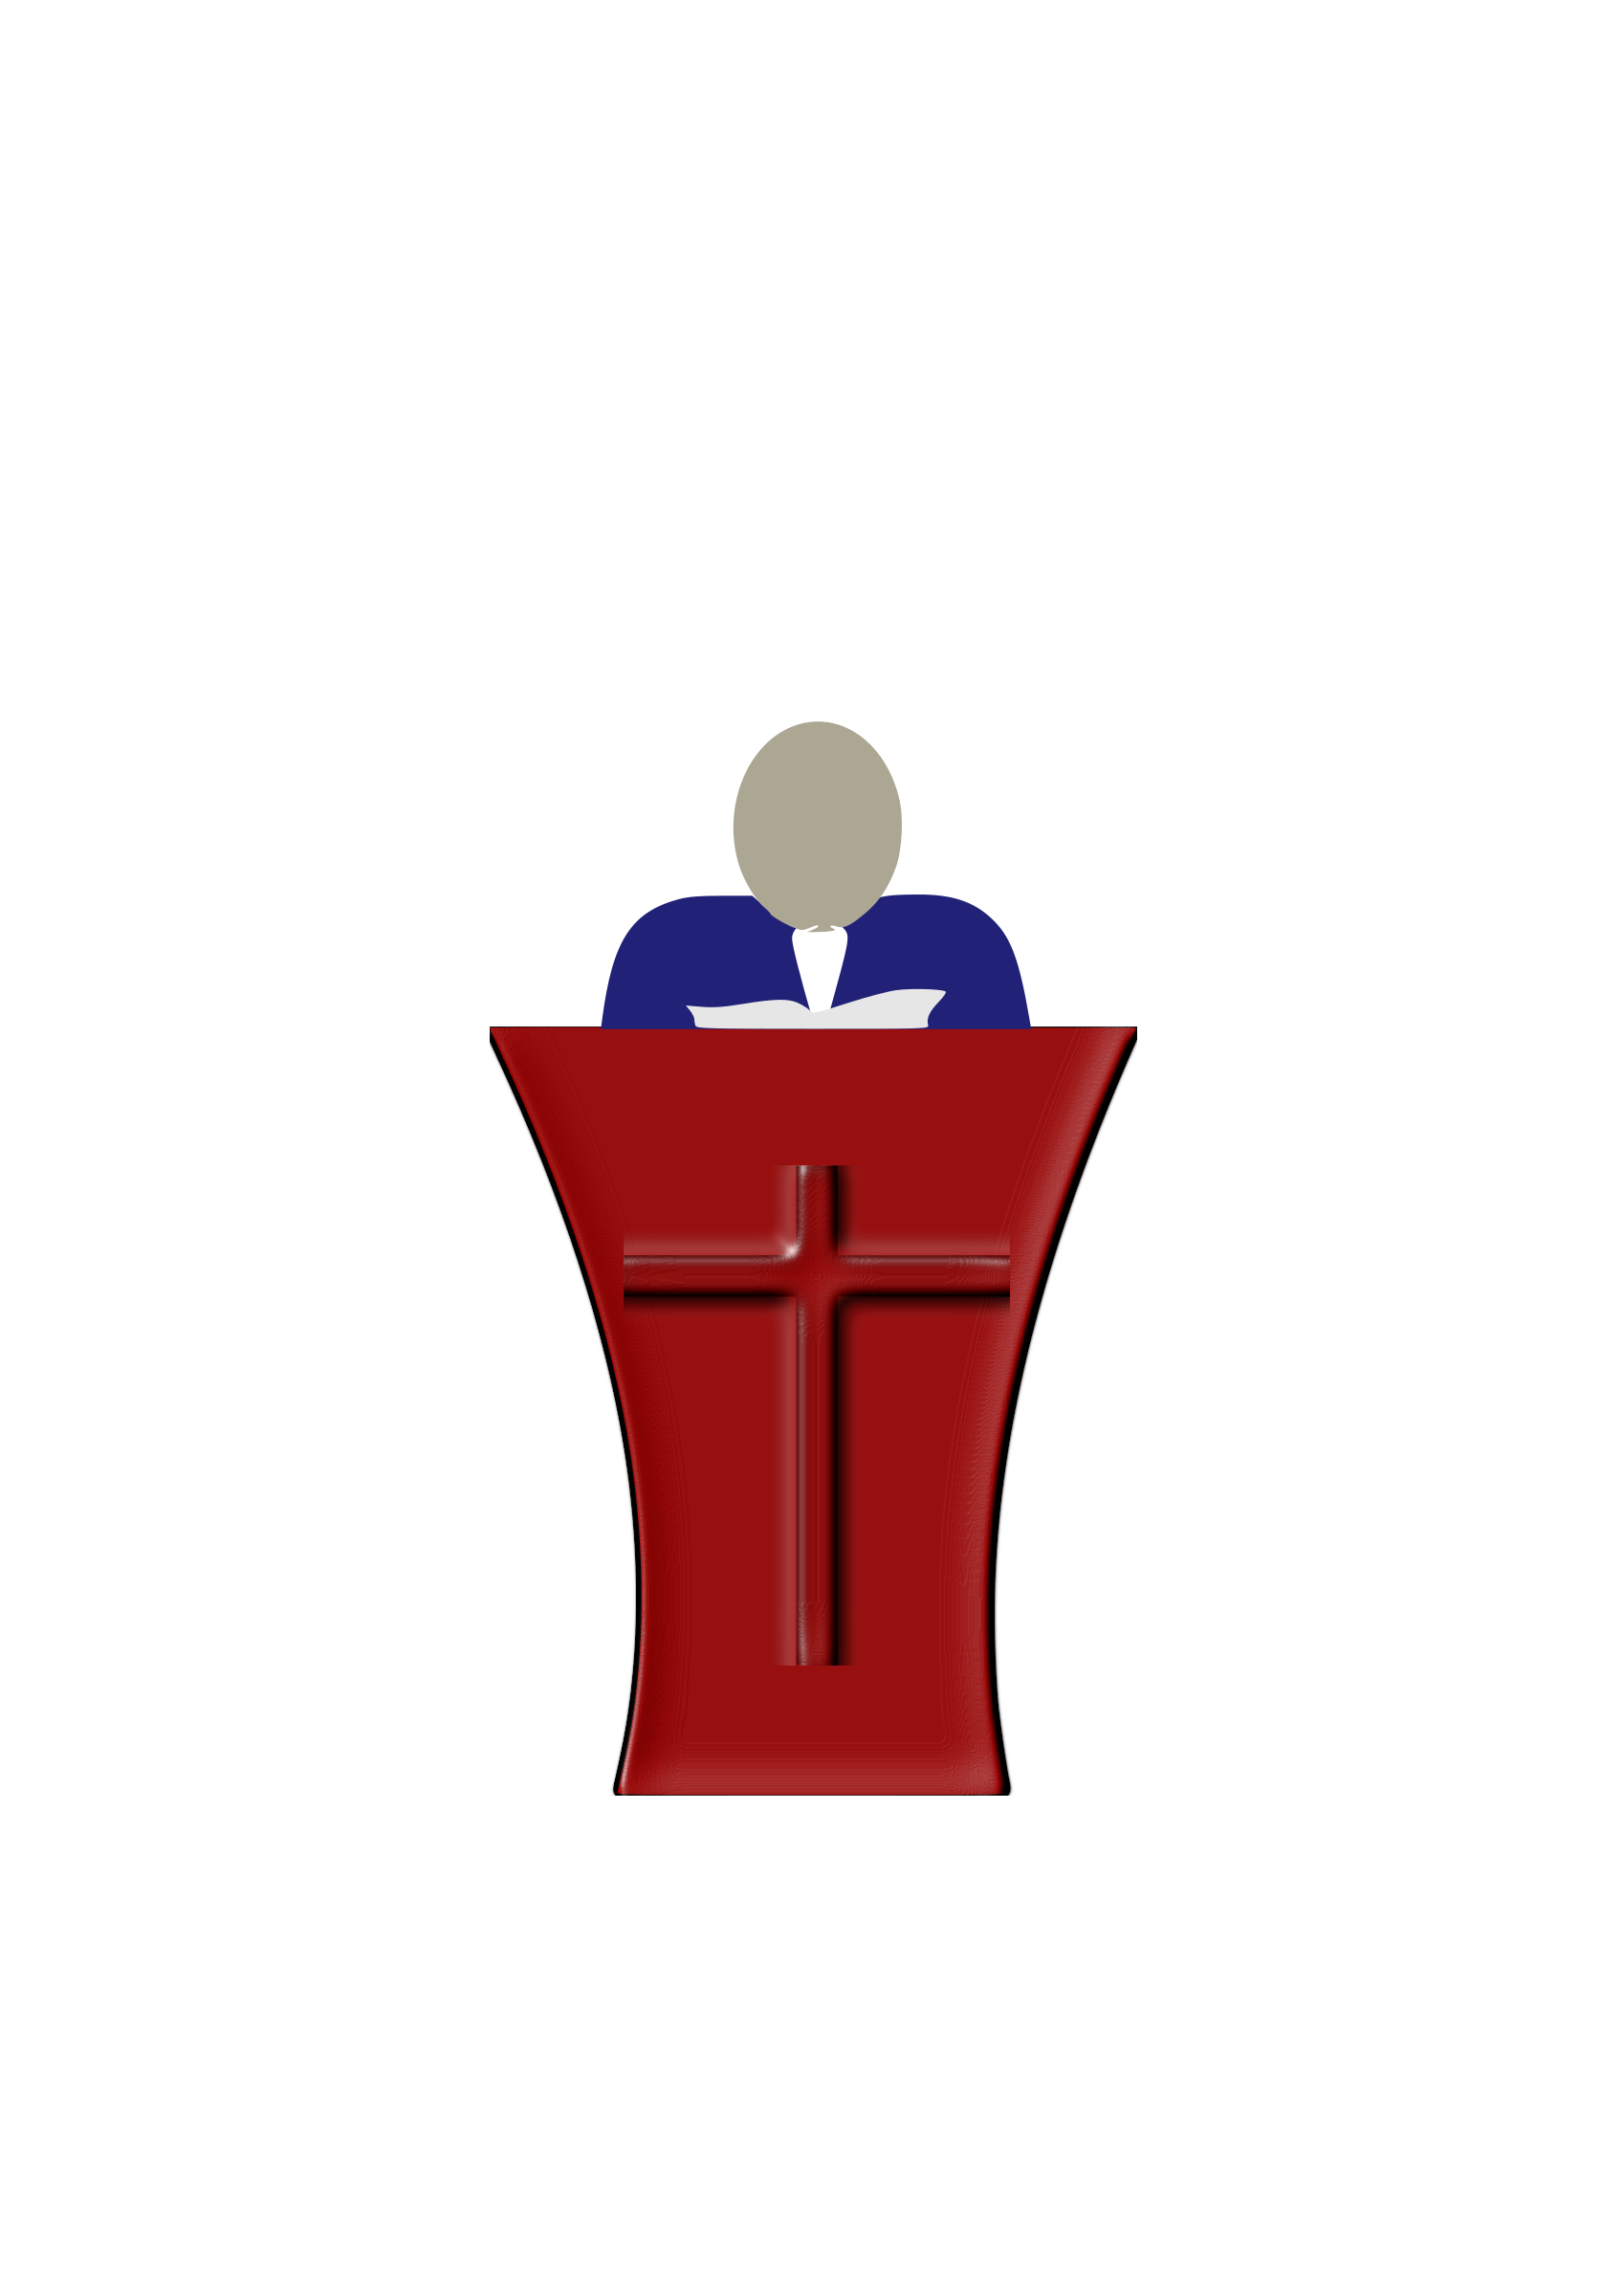 clipart preacher rh openclipart org preacher clip art free preacher clip art free